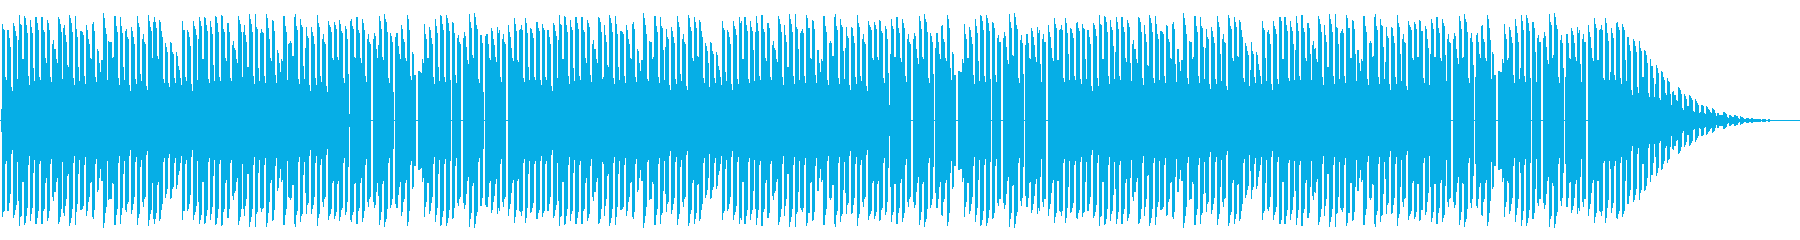 NES STG B01-1(タイトル) の再生済みの波形